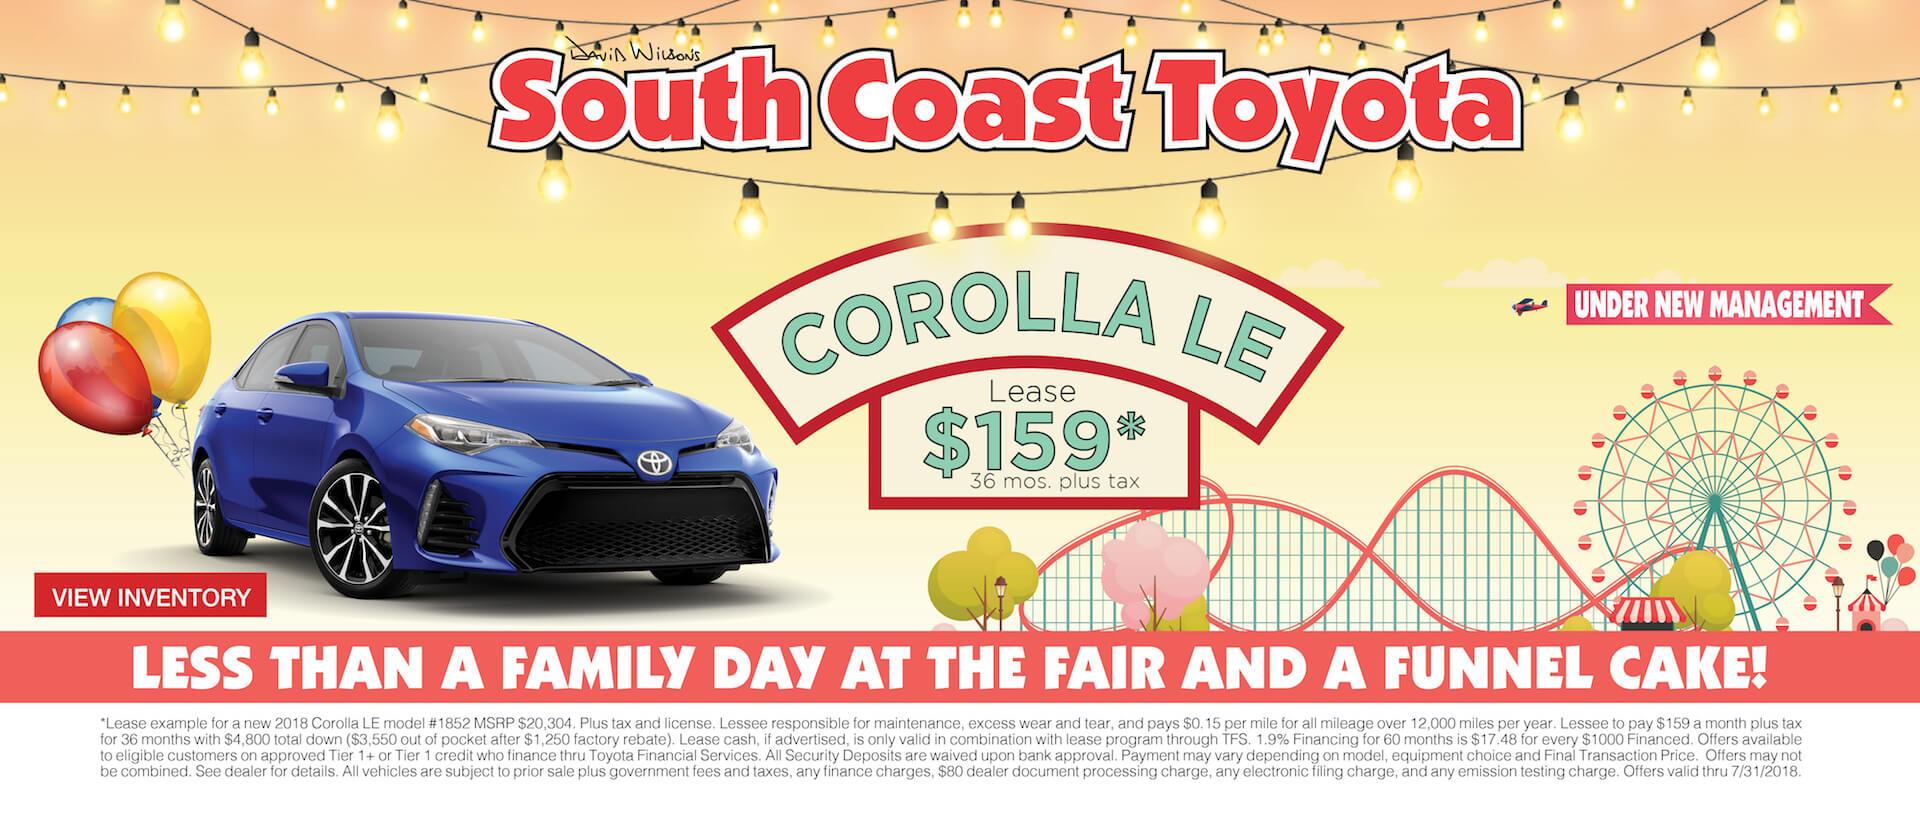 Memorial Day Toyota Corolla $159 Lease